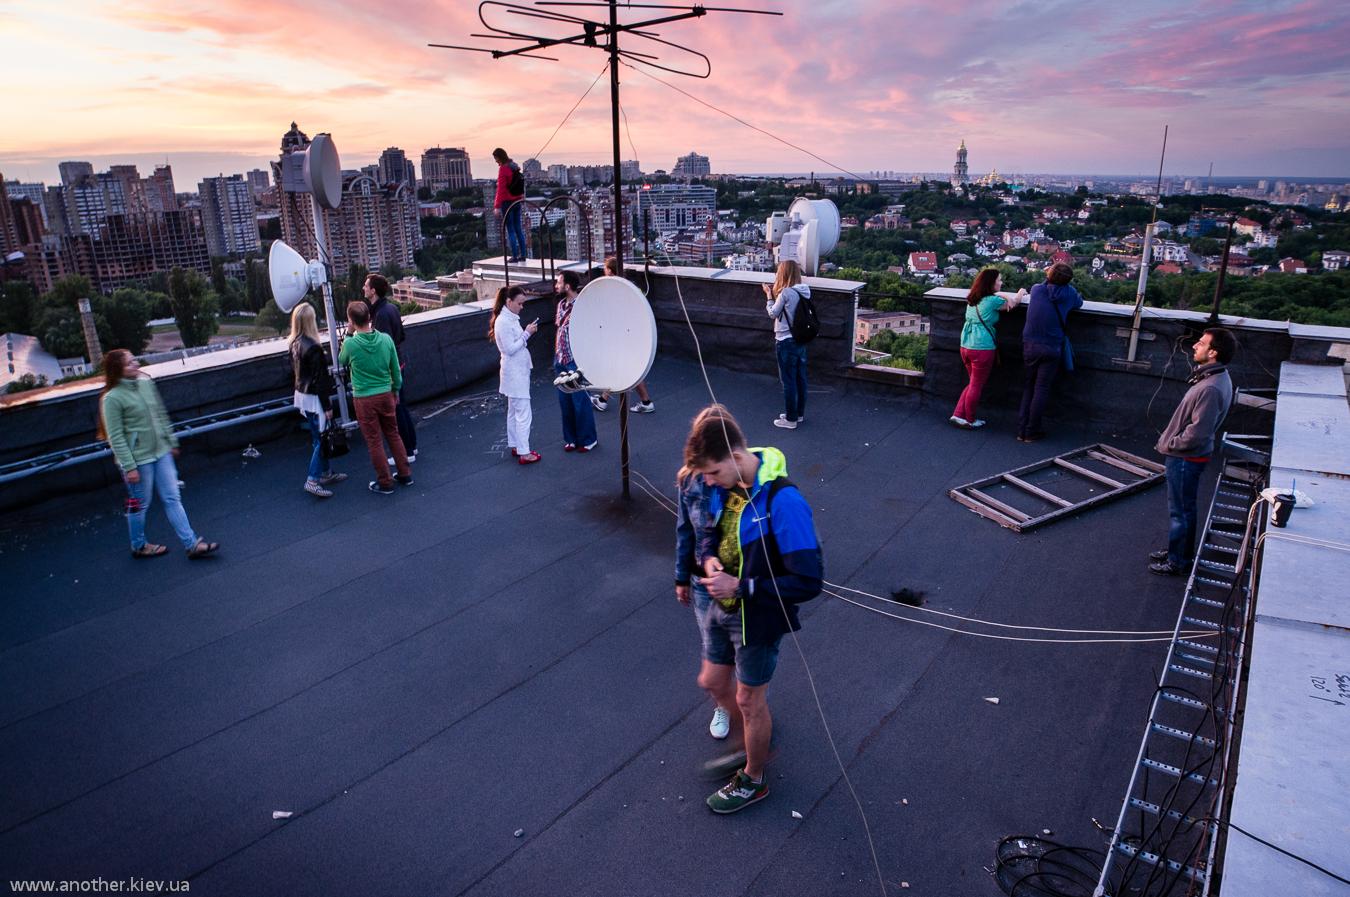 otkrytye-kryshi-v-kieve Экскурсия по крышам Киева 2019.11.17 16:00